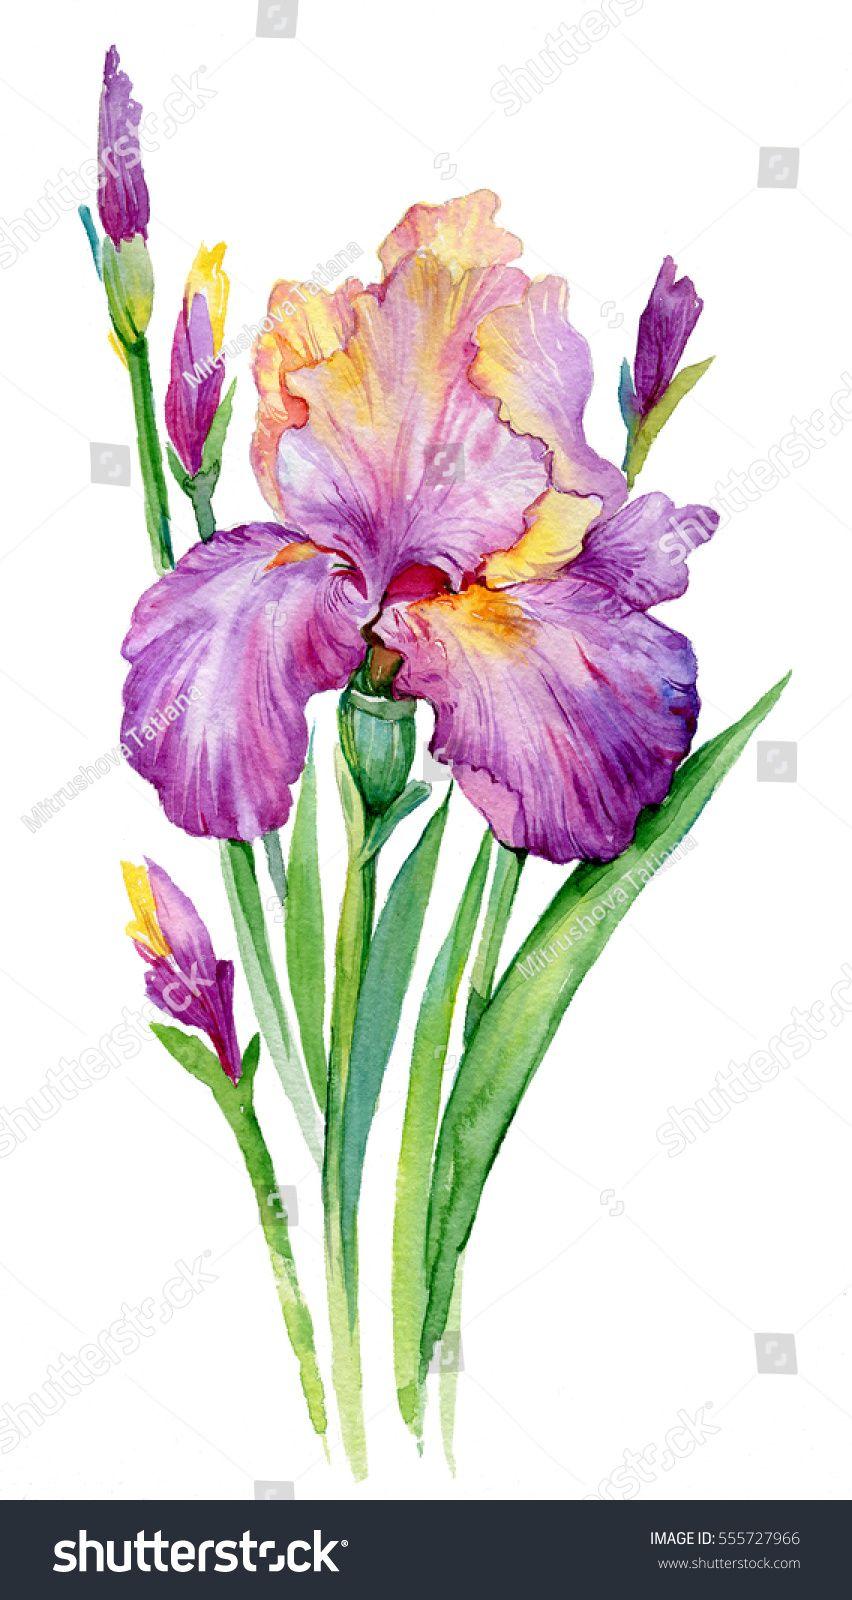 Purple Iris Illustration Watercolor Iris Flower Isolated On White Background In 2020 Watercolor Flowers Paintings Iris Painting Iris Drawing